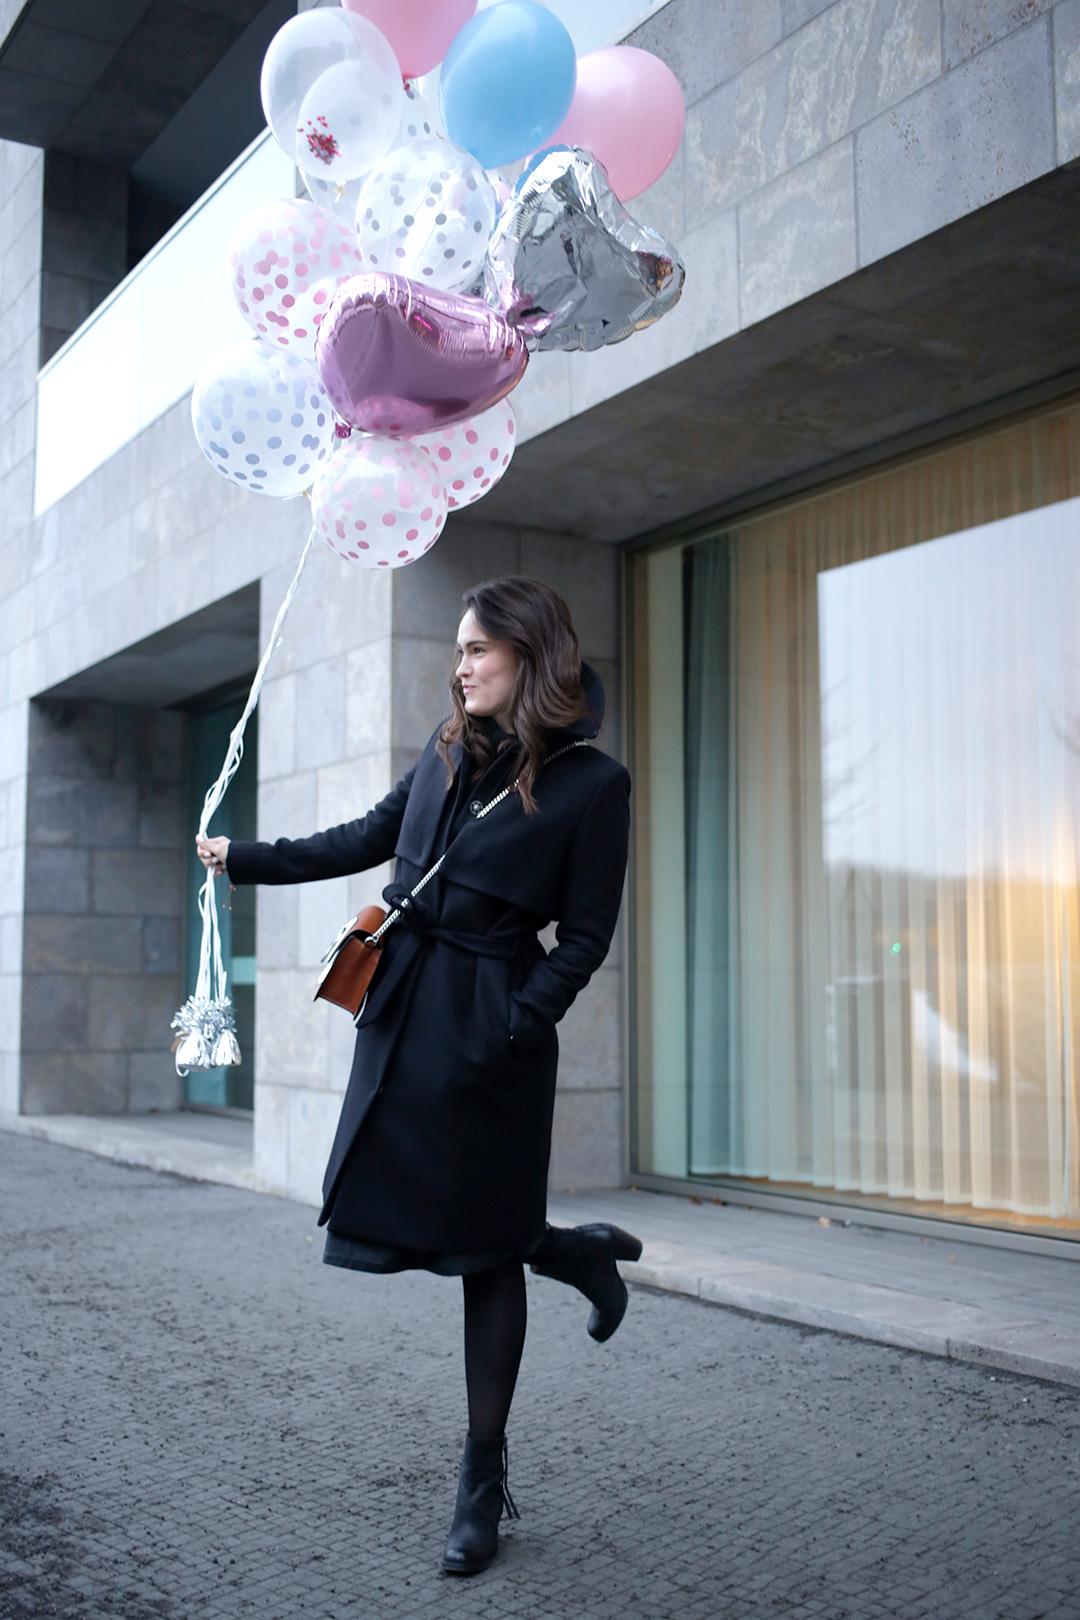 Balloon_look_fw_2017_thatslifeberlin, fashionblogger